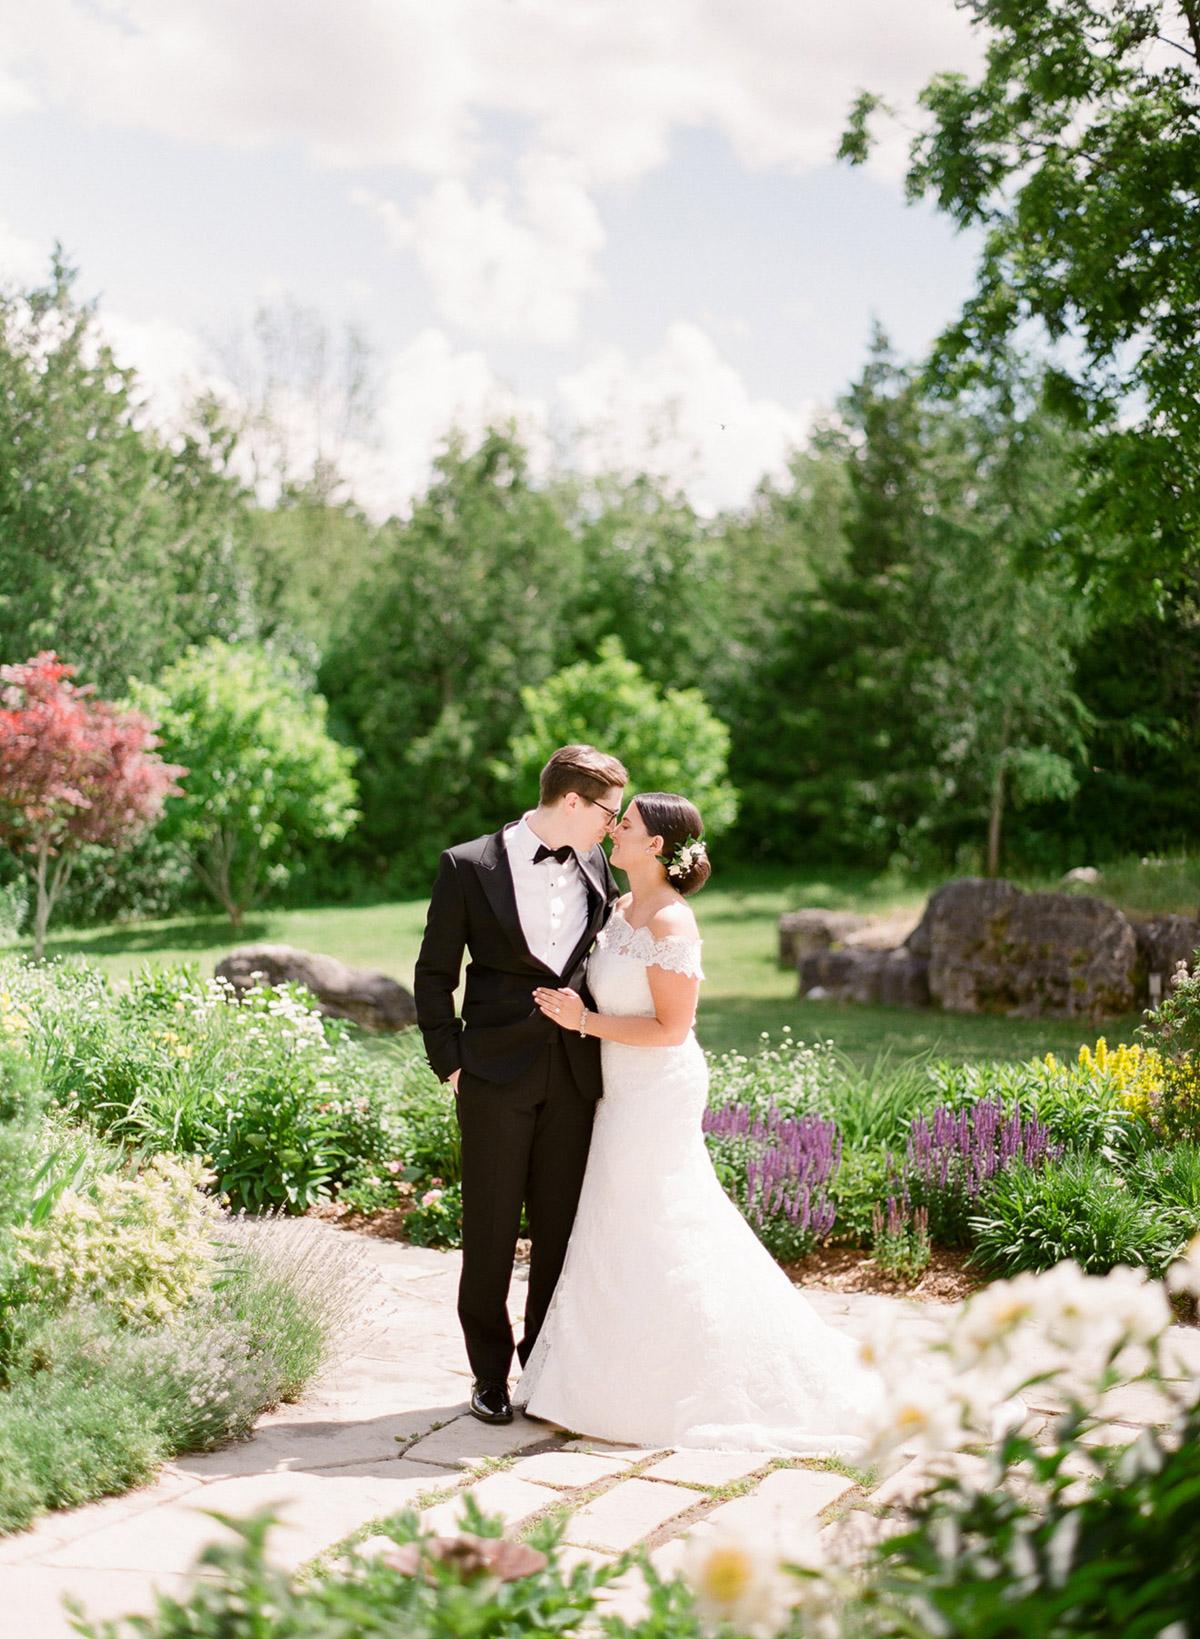 artiese-studios-vineyard-bride-swish-list-private-estate-cambridge-wedding-23.jpg